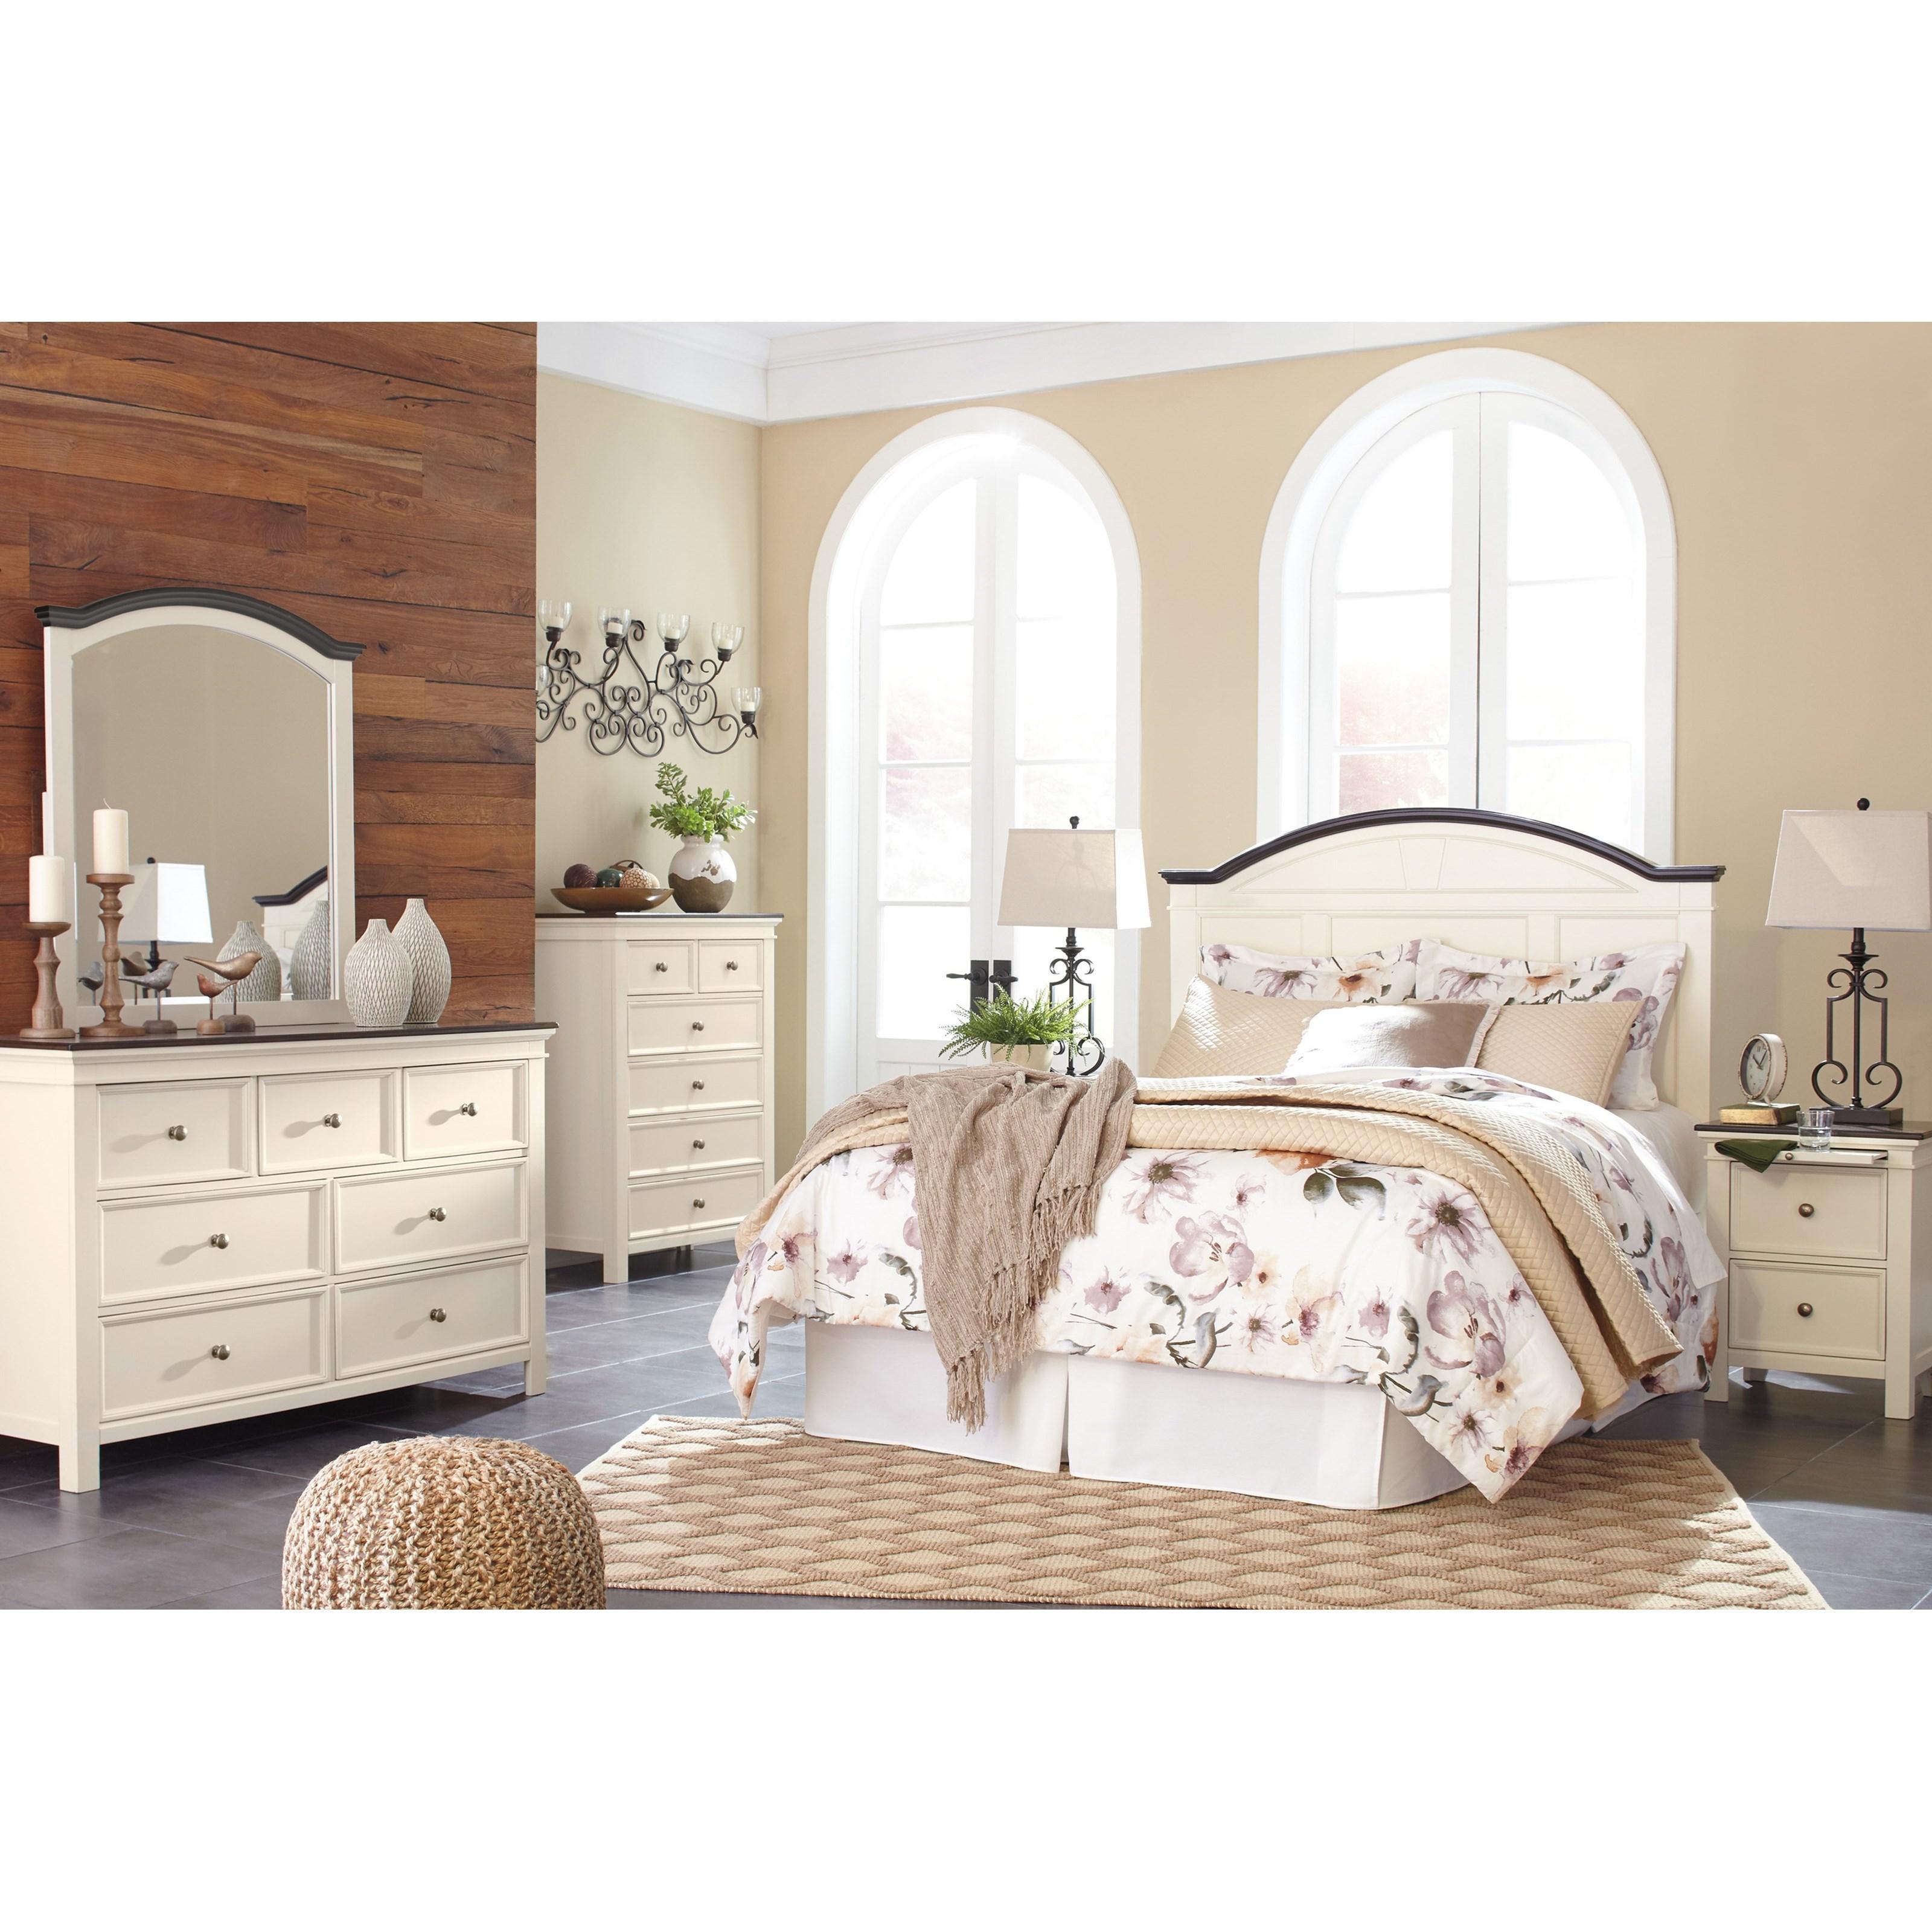 Ashley furniture bedrooms